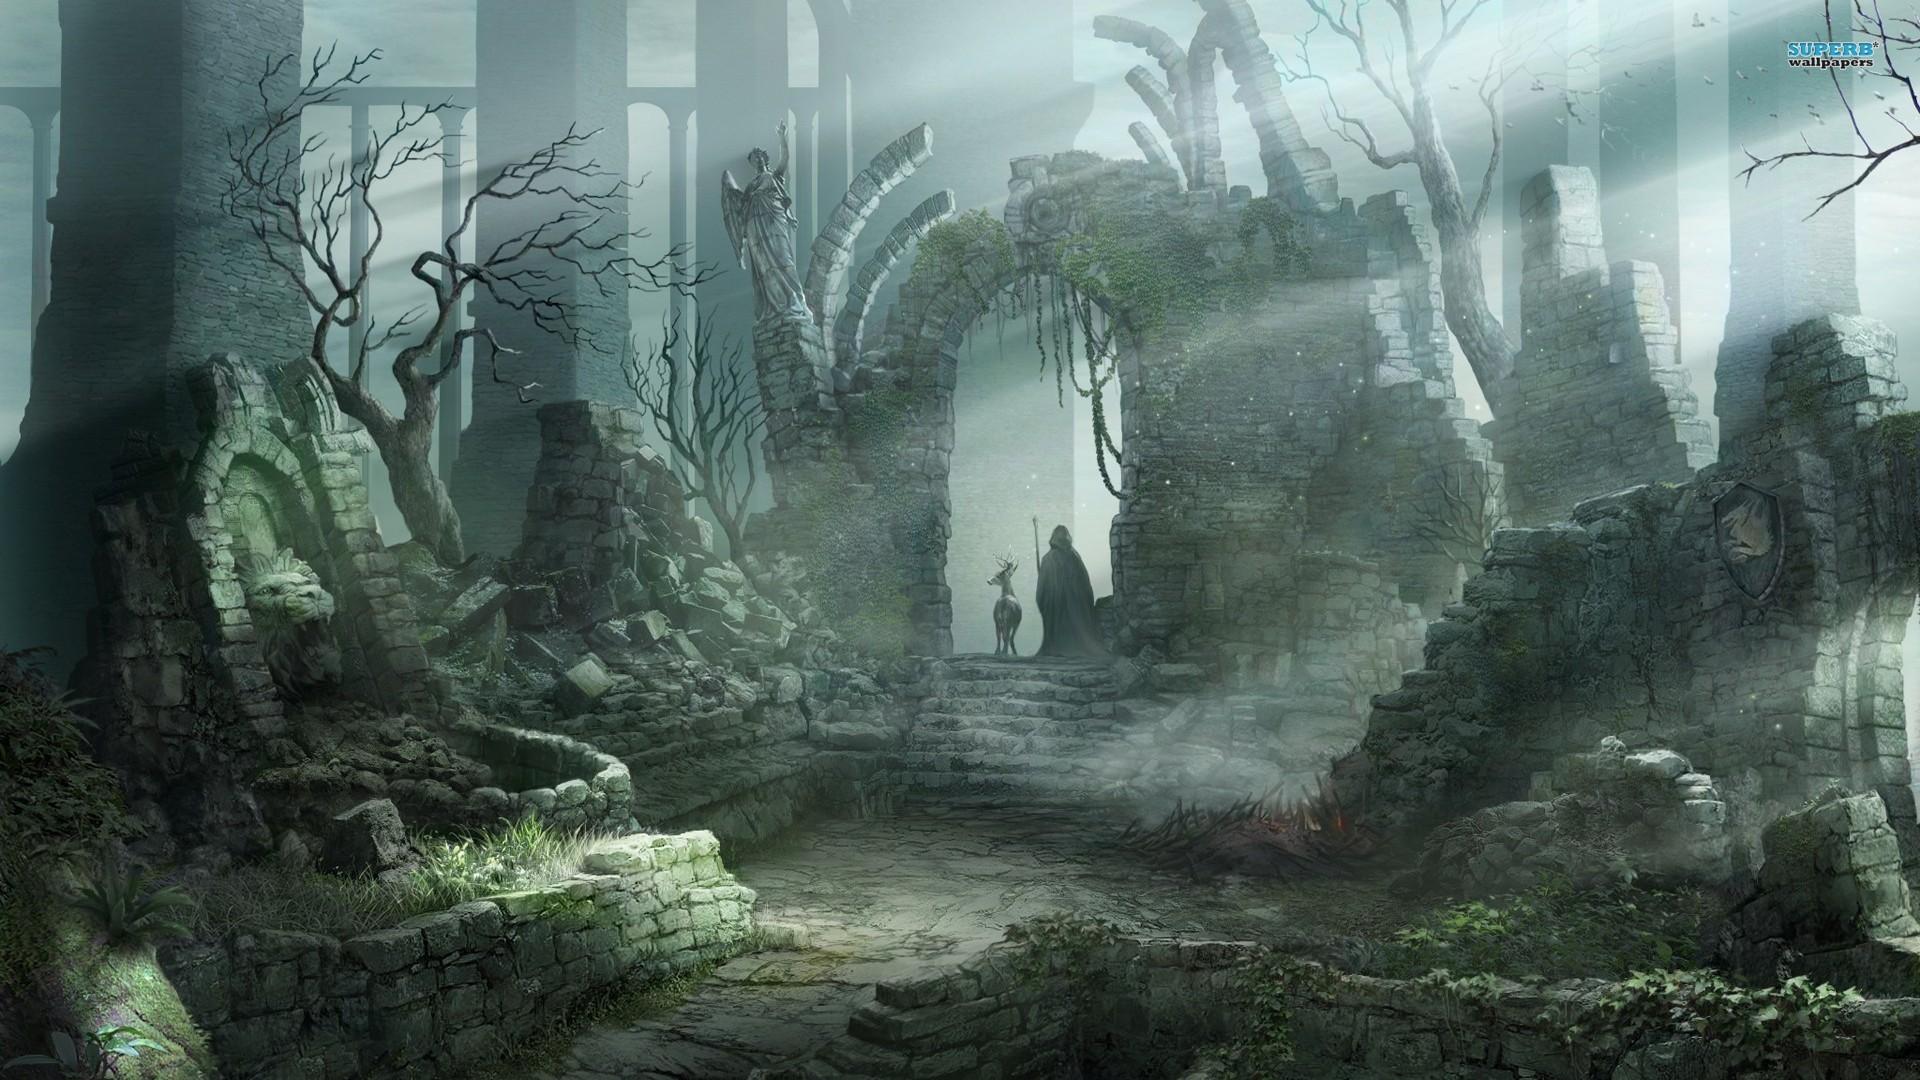 Dark Souls wallpaper 1920x1080 ·① Download free stunning ...